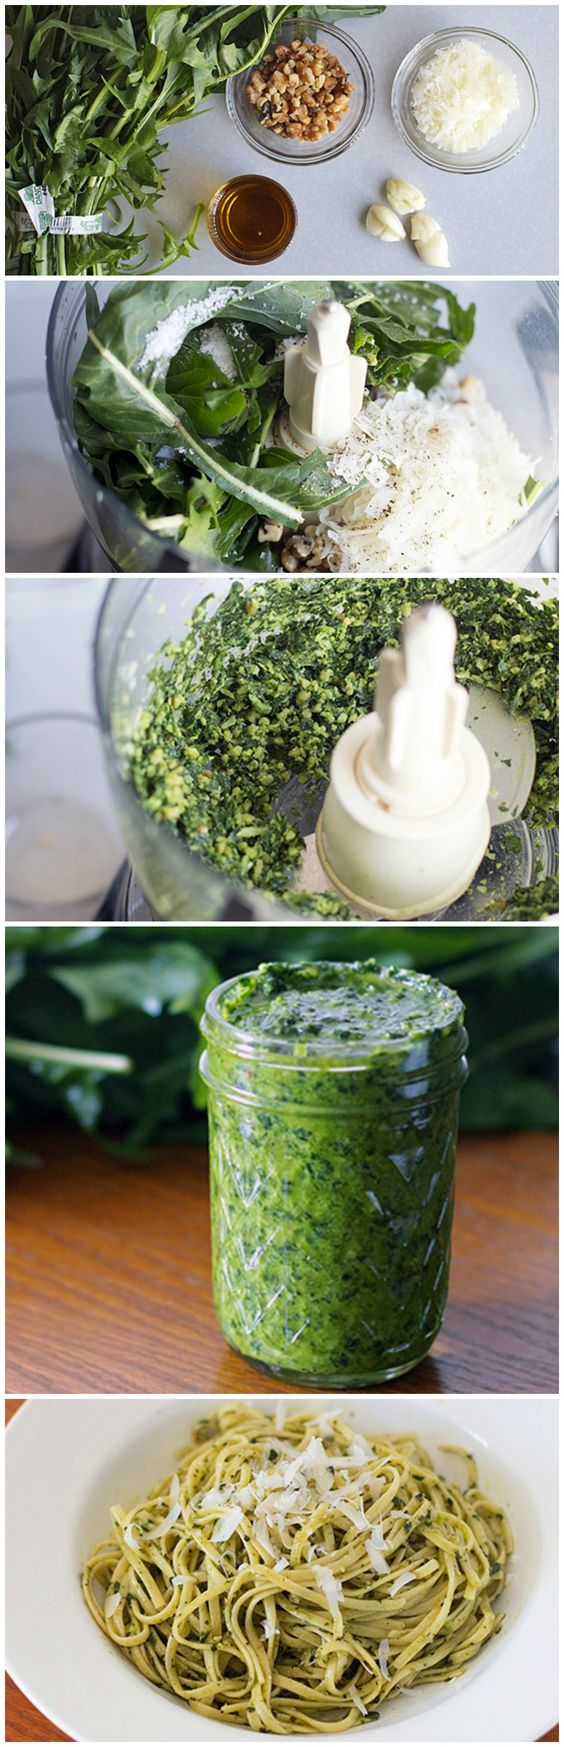 Green pesto, Pesto and Dandelion greens on Pinterest